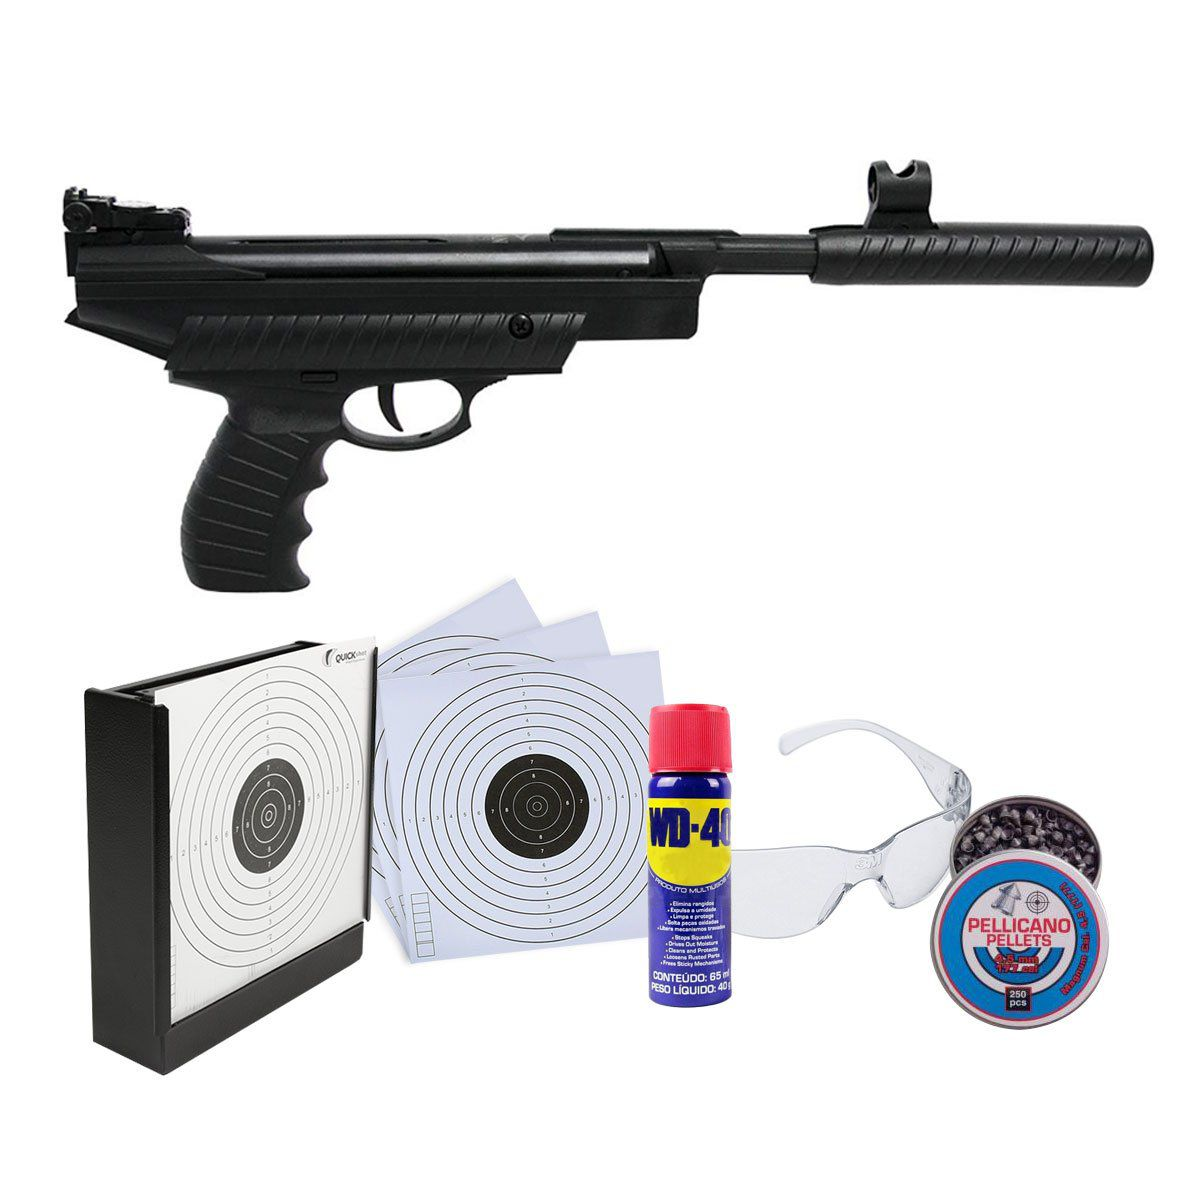 Pistola Hatsan HT25 4,5+Colet de Chumbinhos+Alvo+Óleo+Óculos